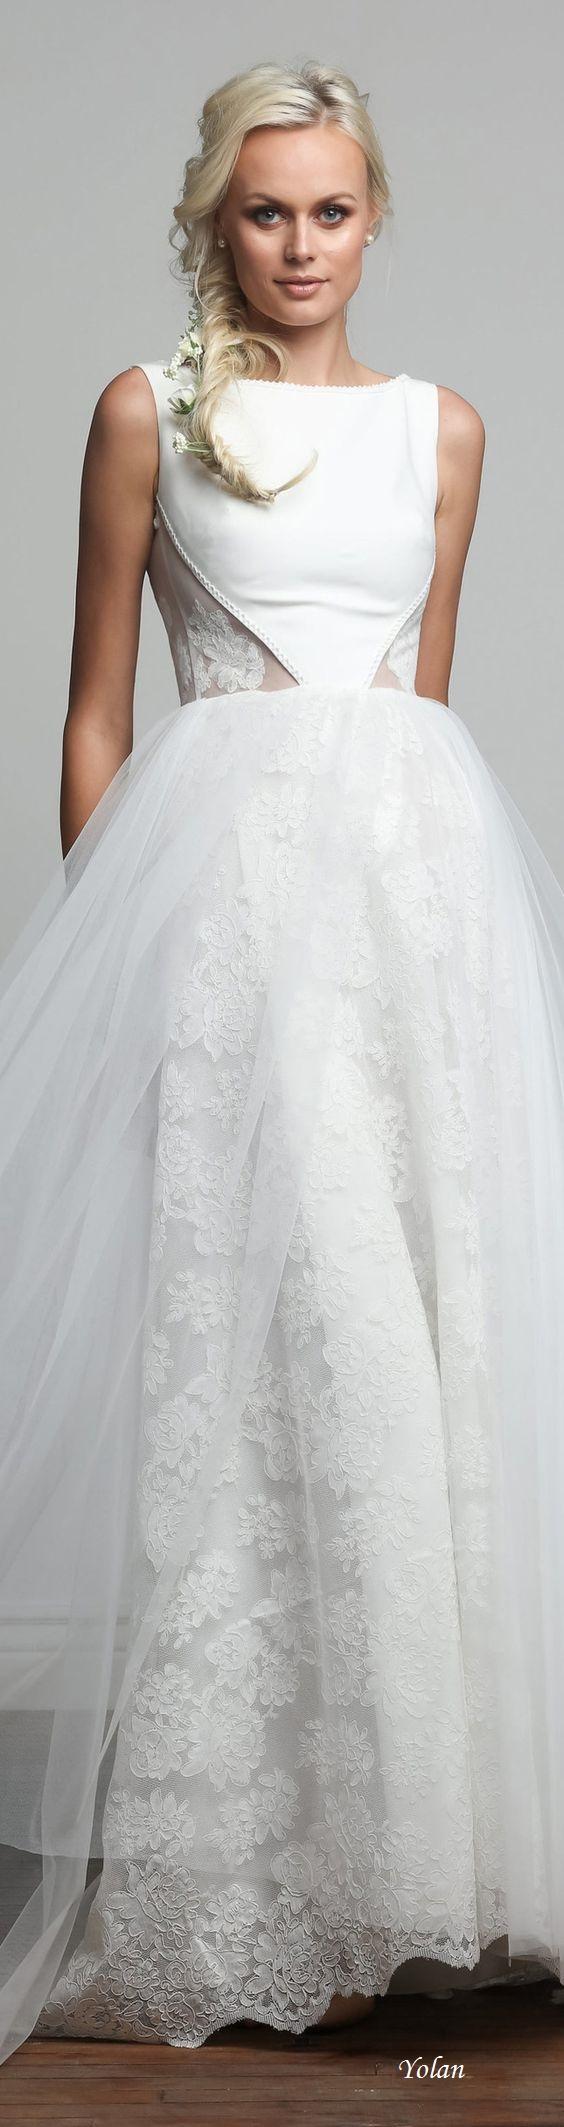 bridal barbara kavchok elegancia en blanco pinterest